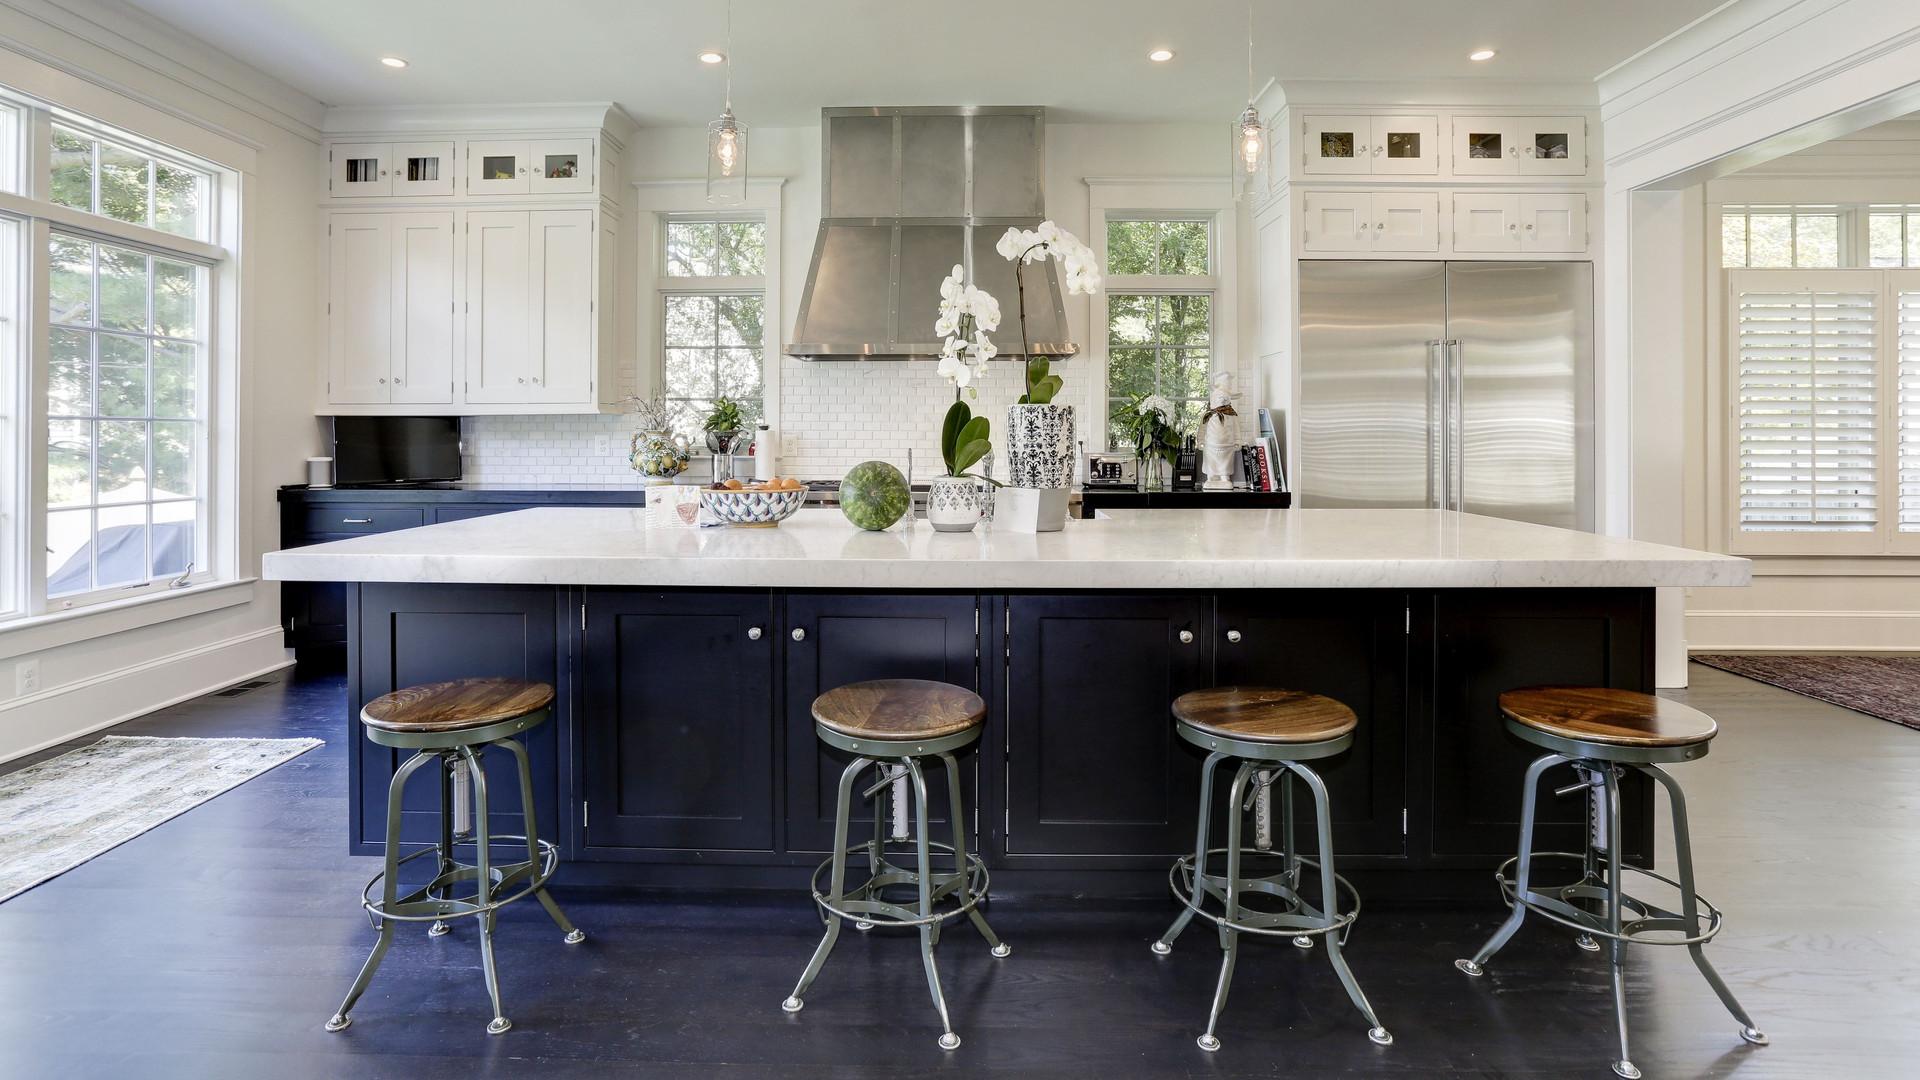 Cabinet design in Annapolis MD